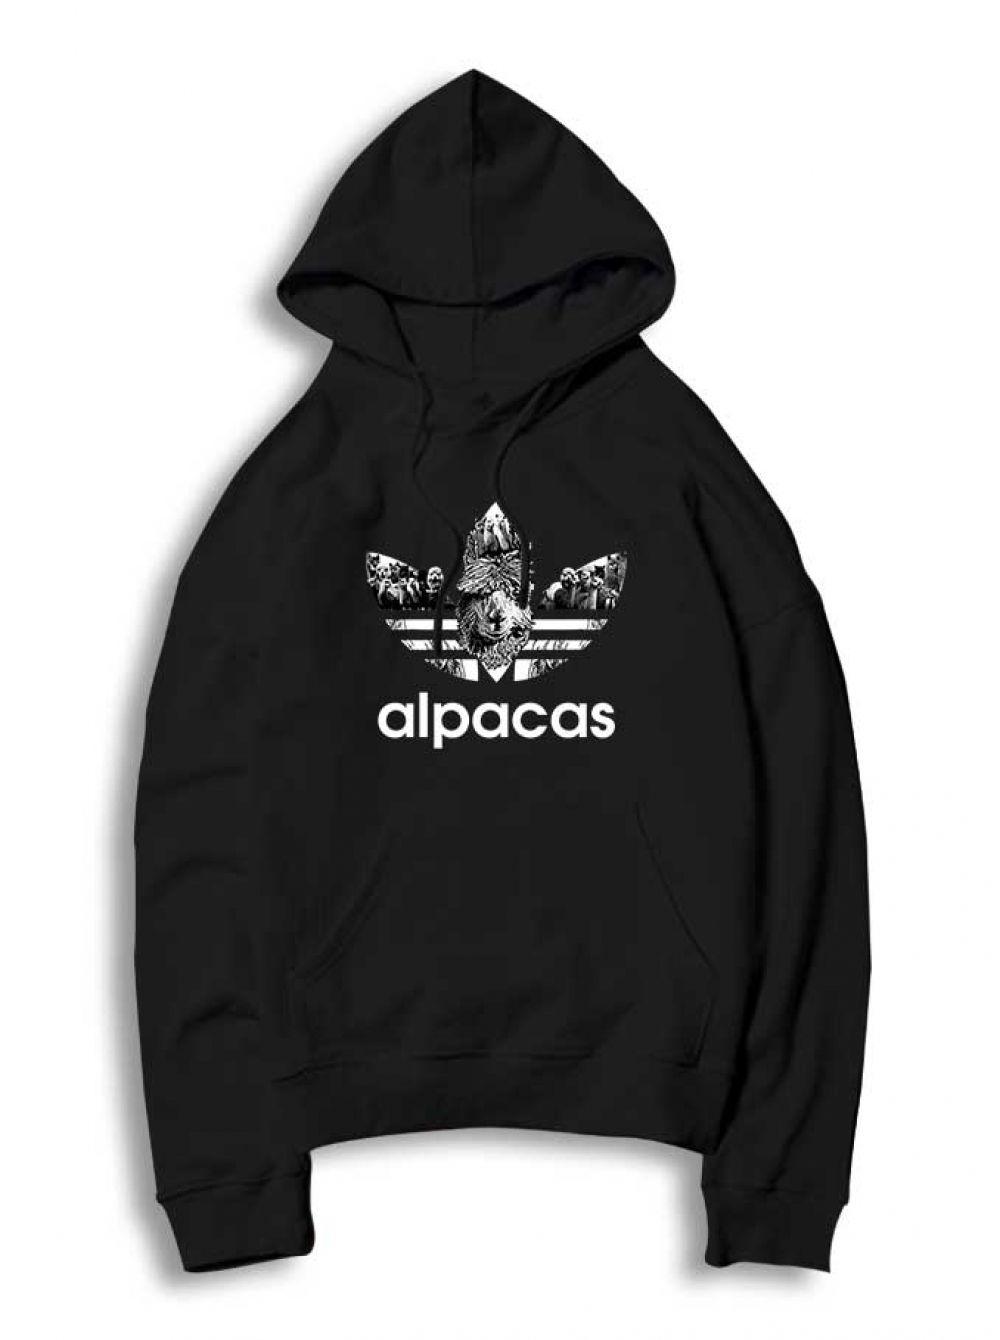 Adidas Parody Alpacas Hoodie For Women S Or Men S Hoodies Fall Hoodies Hoodie Streetwear [ 1340 x 1000 Pixel ]